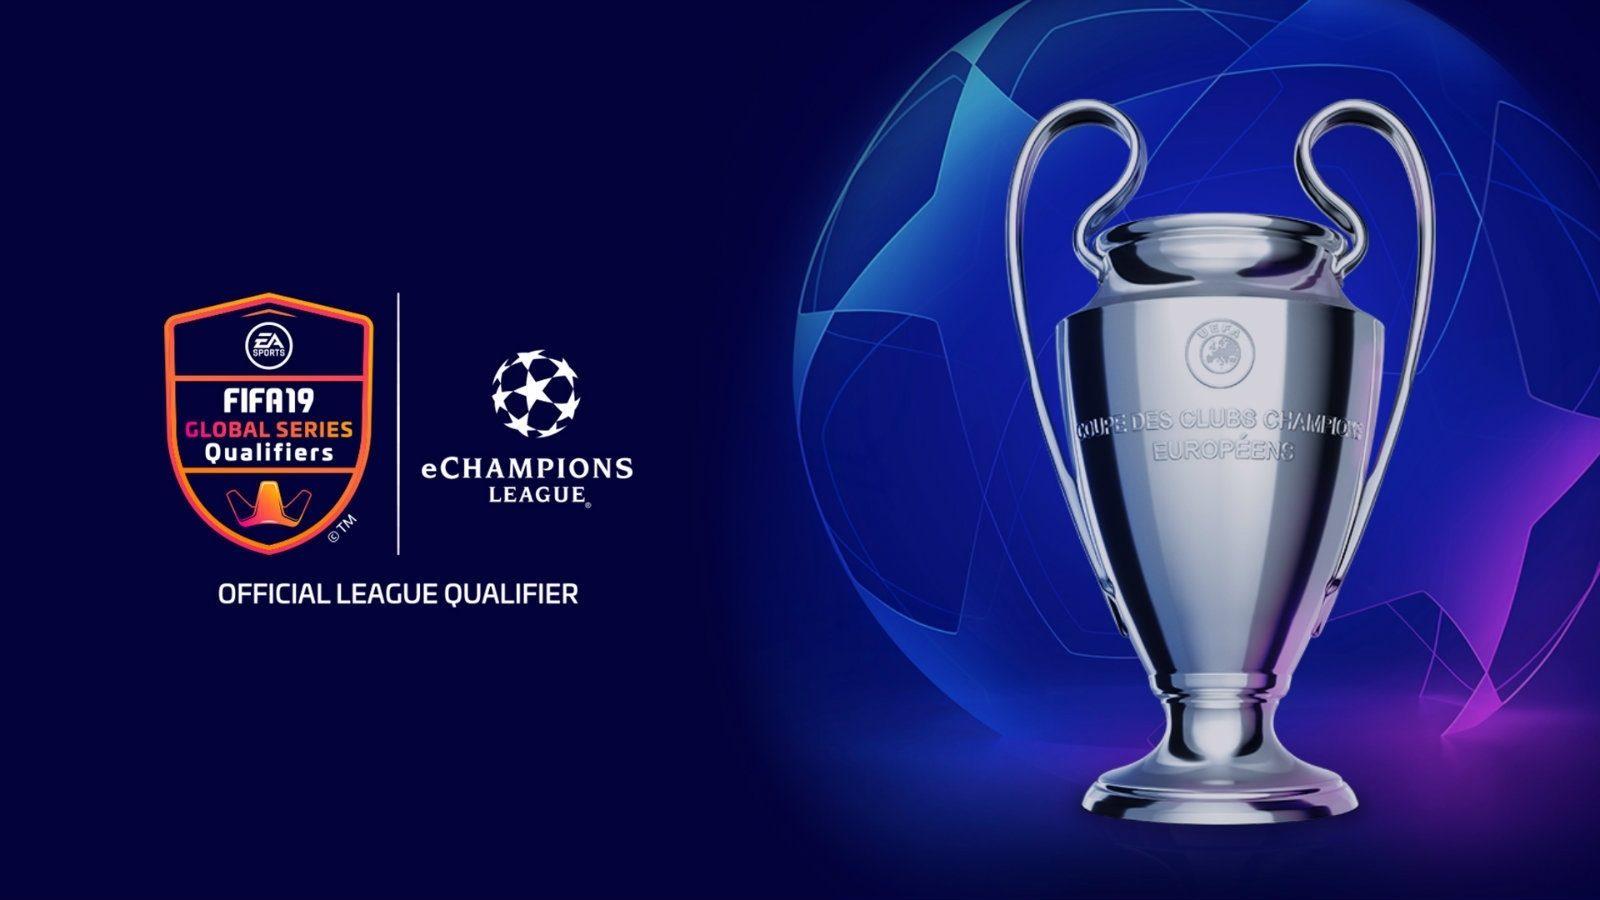 eChampions League coming to FIFA 19. Credit: EA Sports